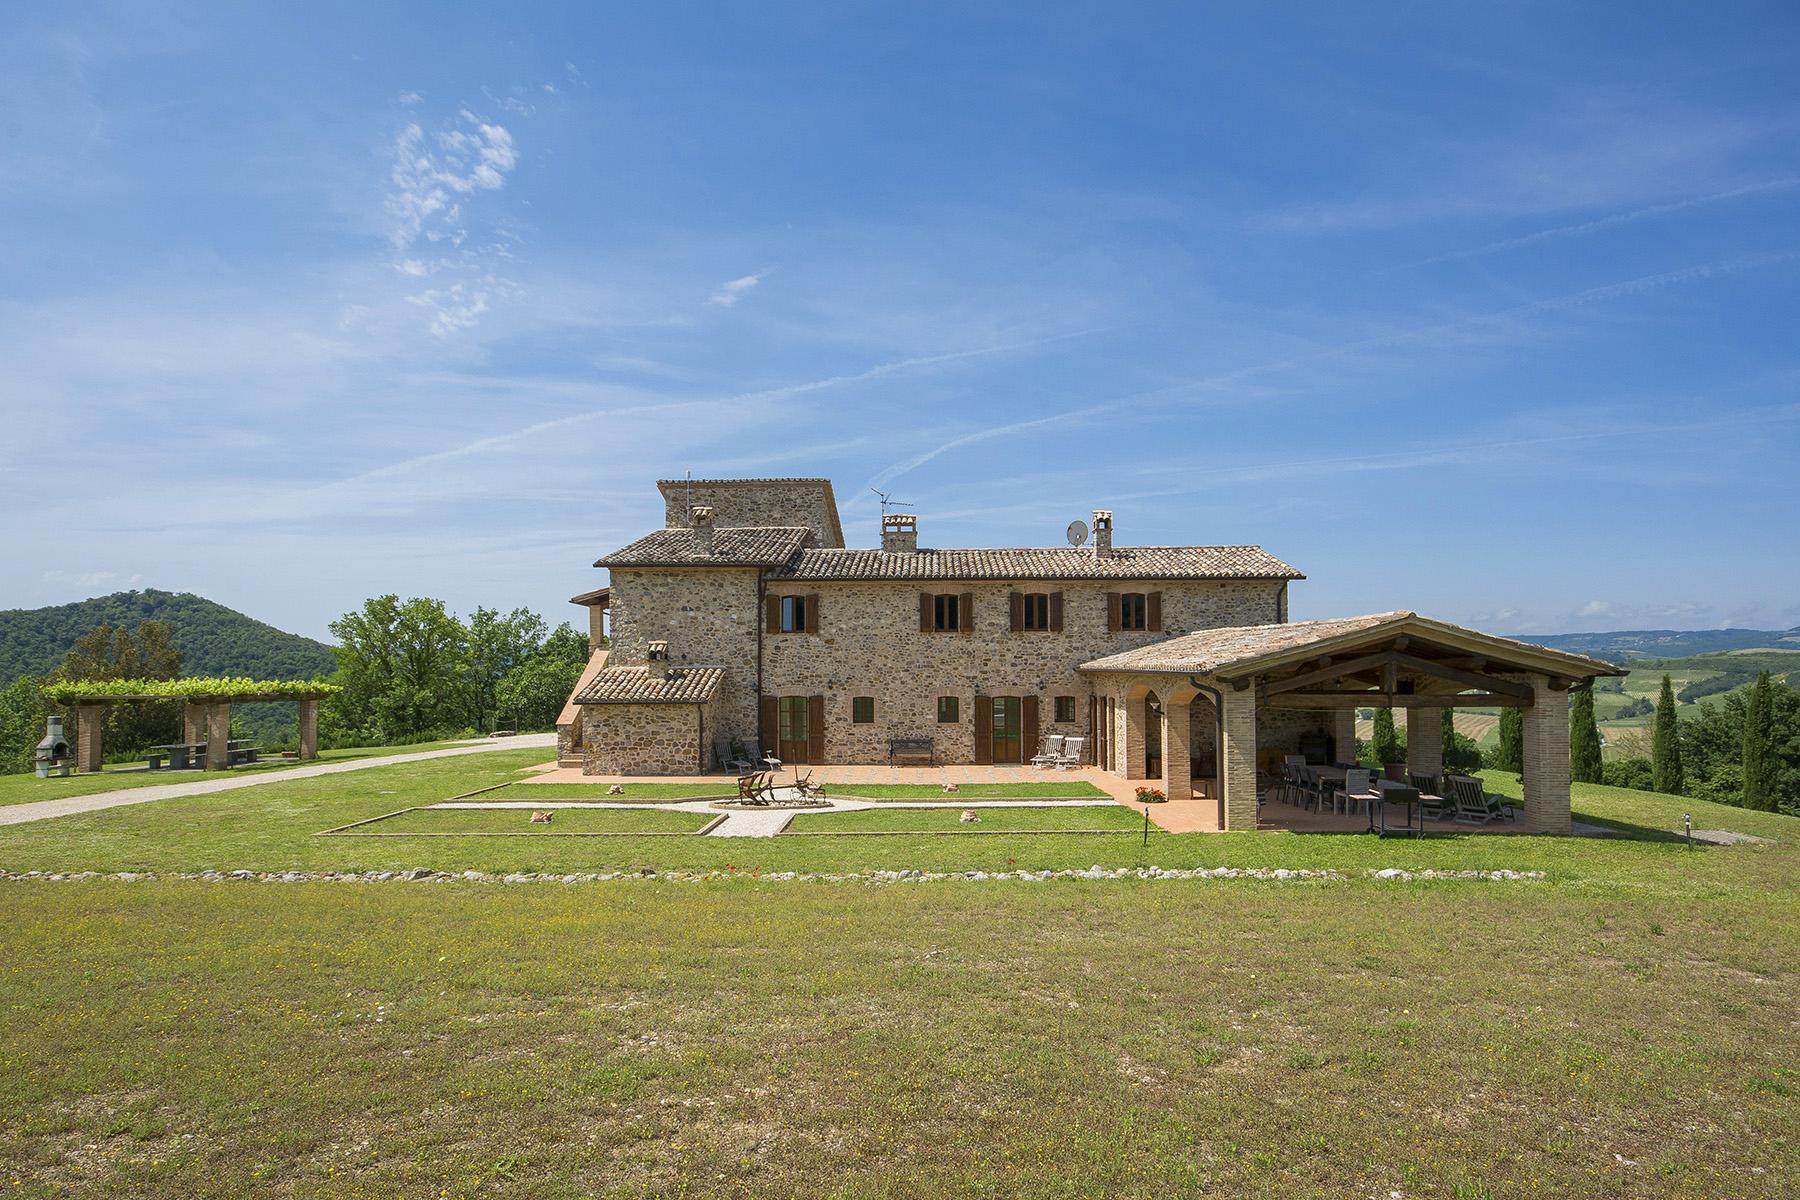 Eccezionale proprietà tra Toscana e Umbria - 5